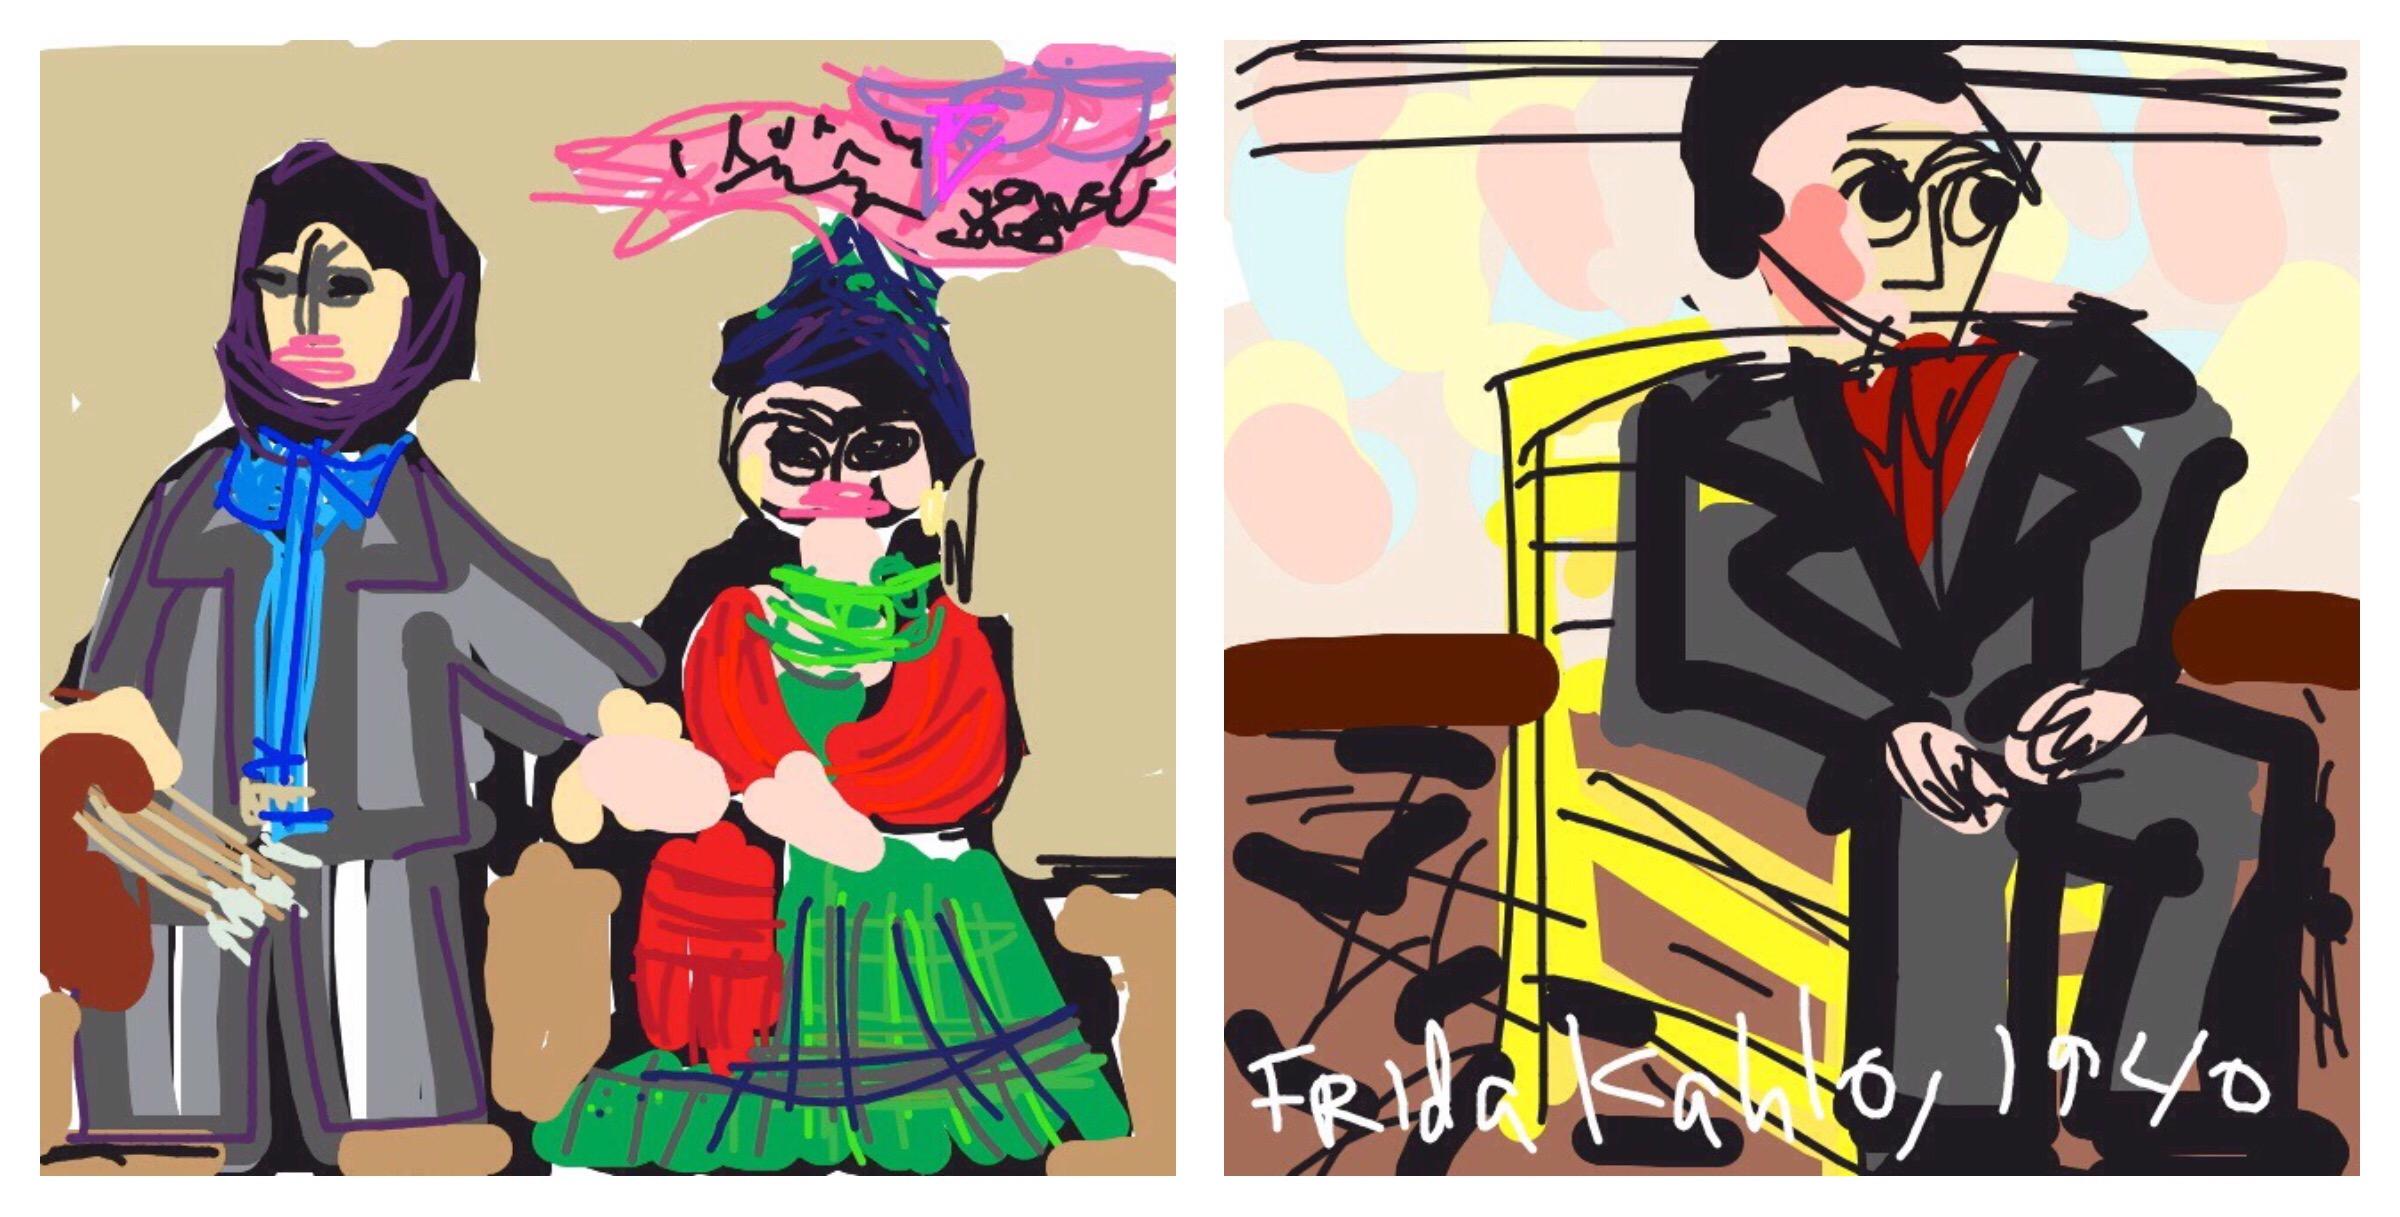 Frida and Diego Rivera , Frida Kahlo, 1931 at @SFMOMA, and  Self-Portrait with Cropped Hair,  Frida Kahlo, 1940 at @MuseumModernArt